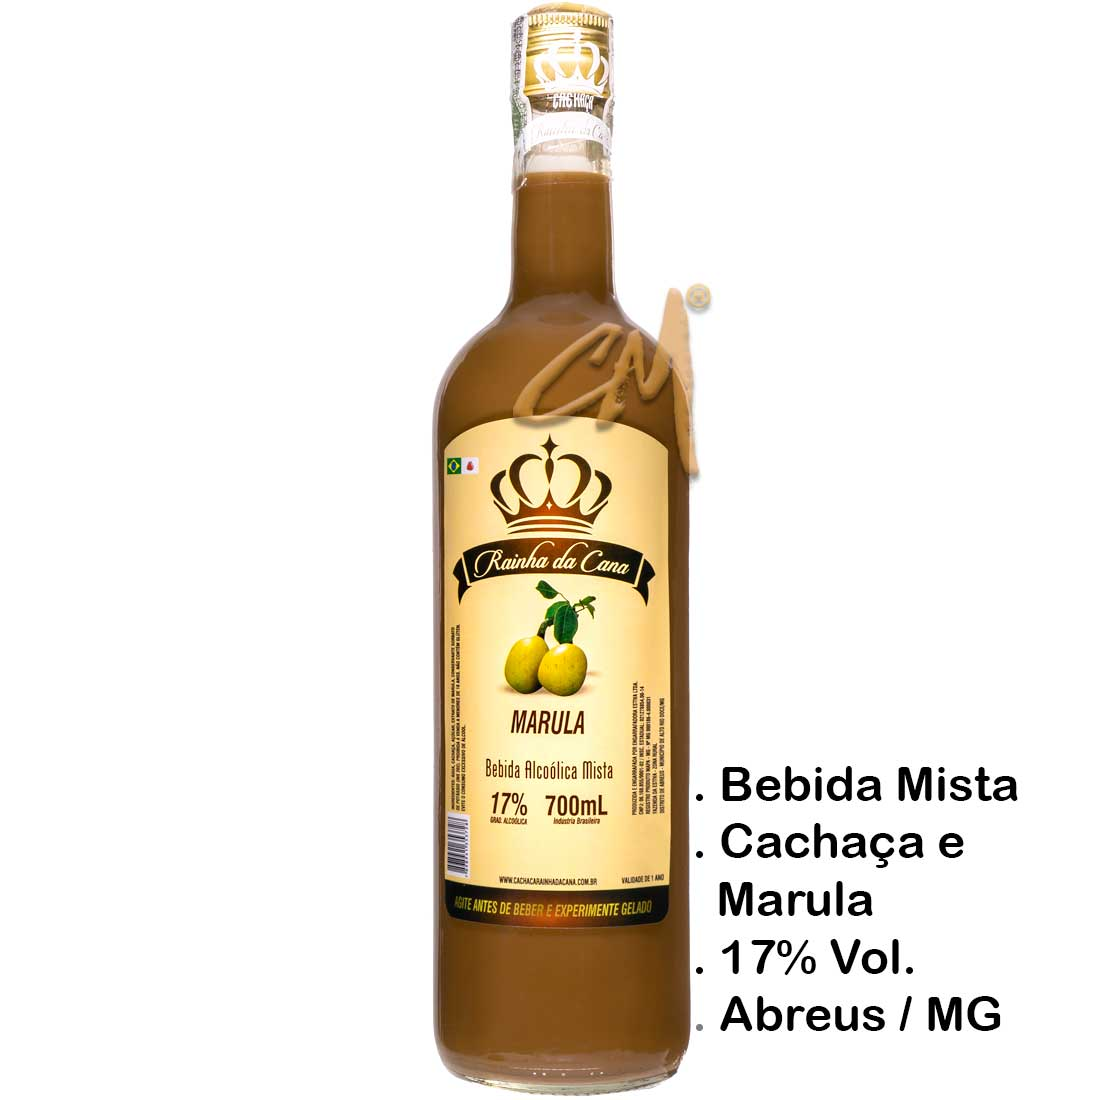 Bebida Mista Cachaça Rainha da Cana Marula 700 ml (Alto Rio Doce - MG)